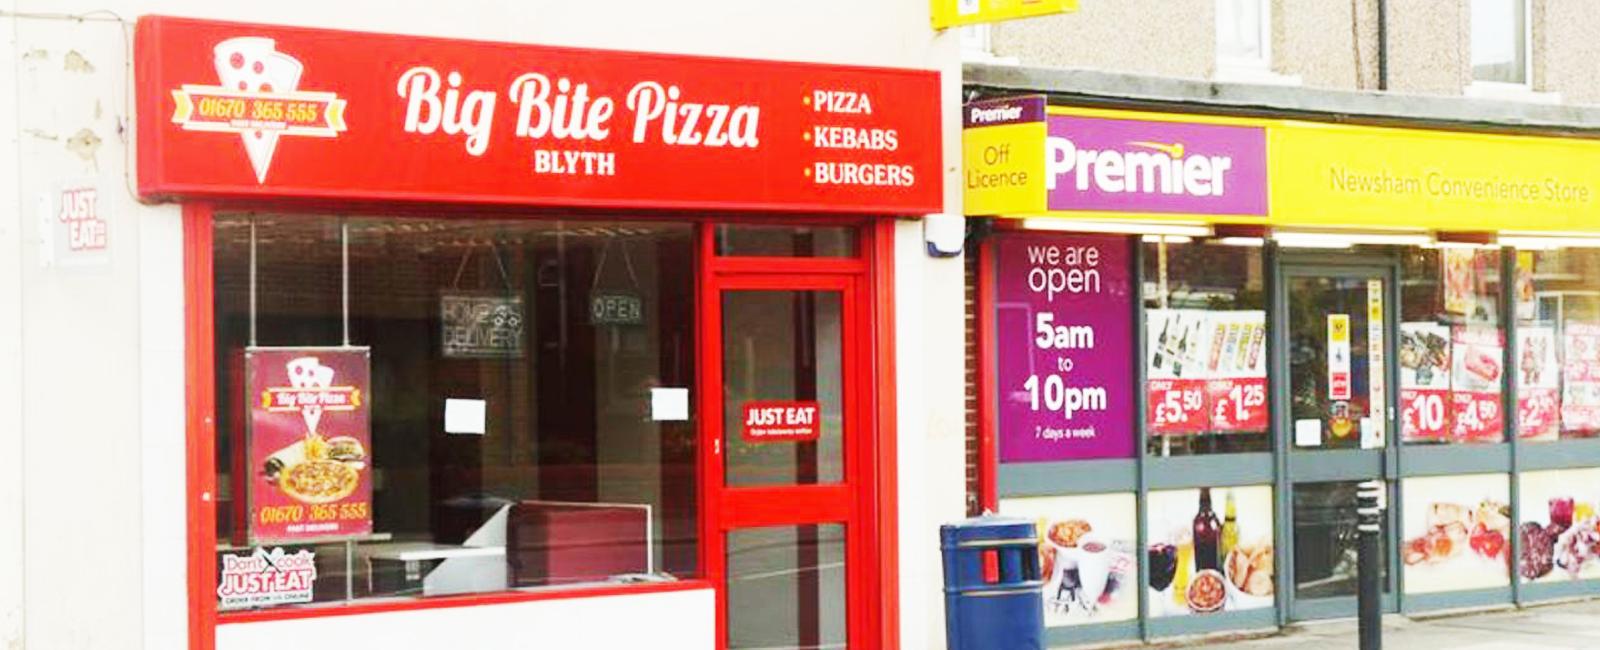 Big Bite Pizza Big Bite Pizza Blyth Tyne And Wear